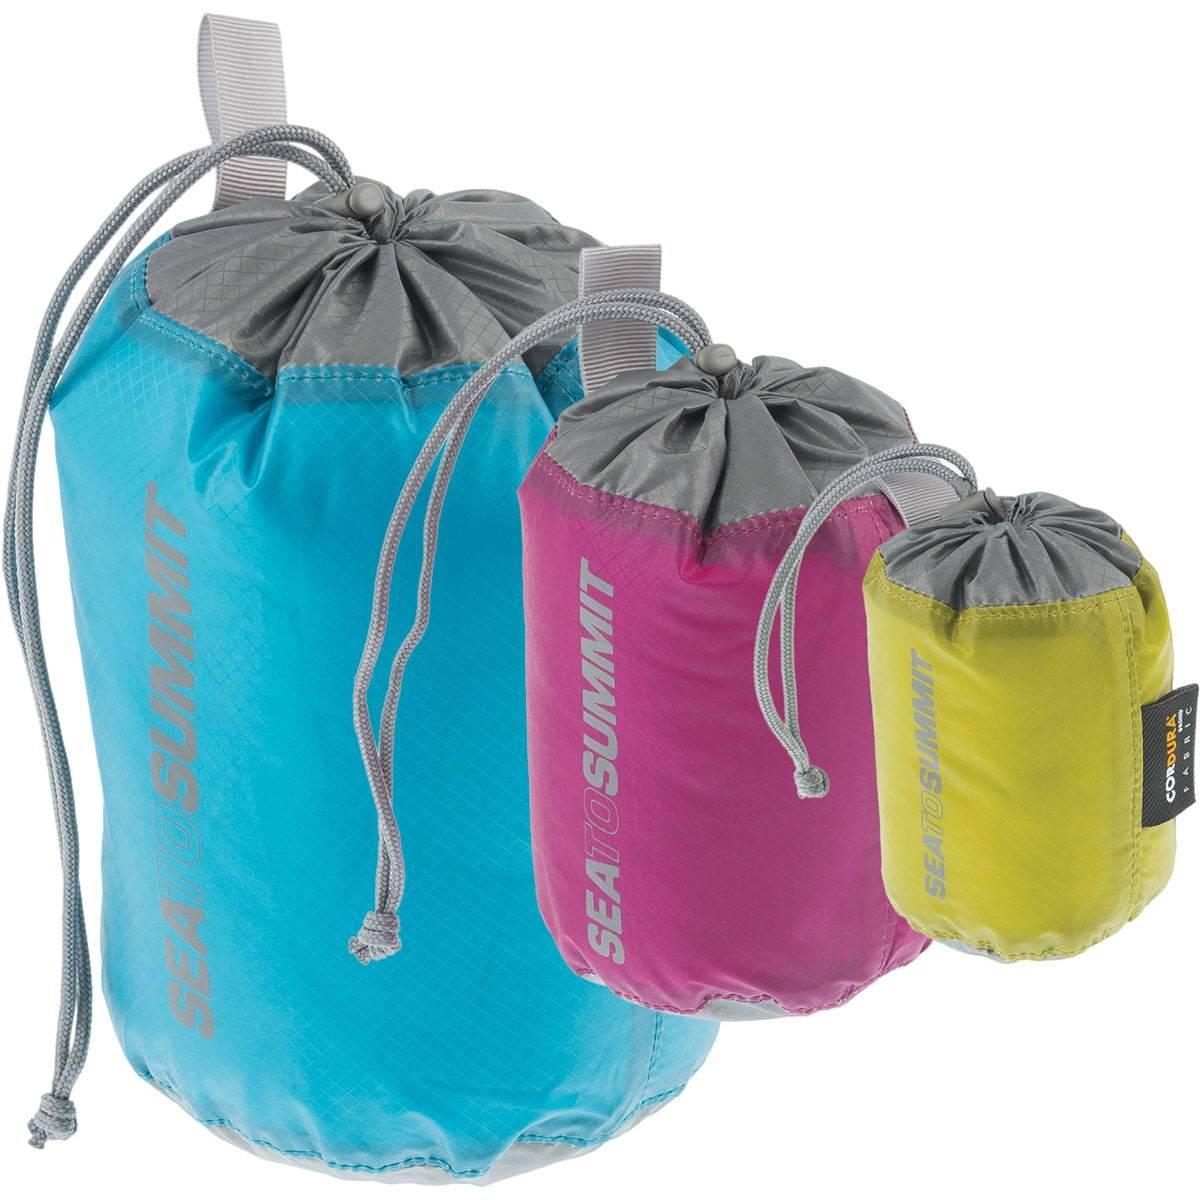 Sea to Summit TravellingLight Stuff Sacks - Packbeutelset - Bild 1